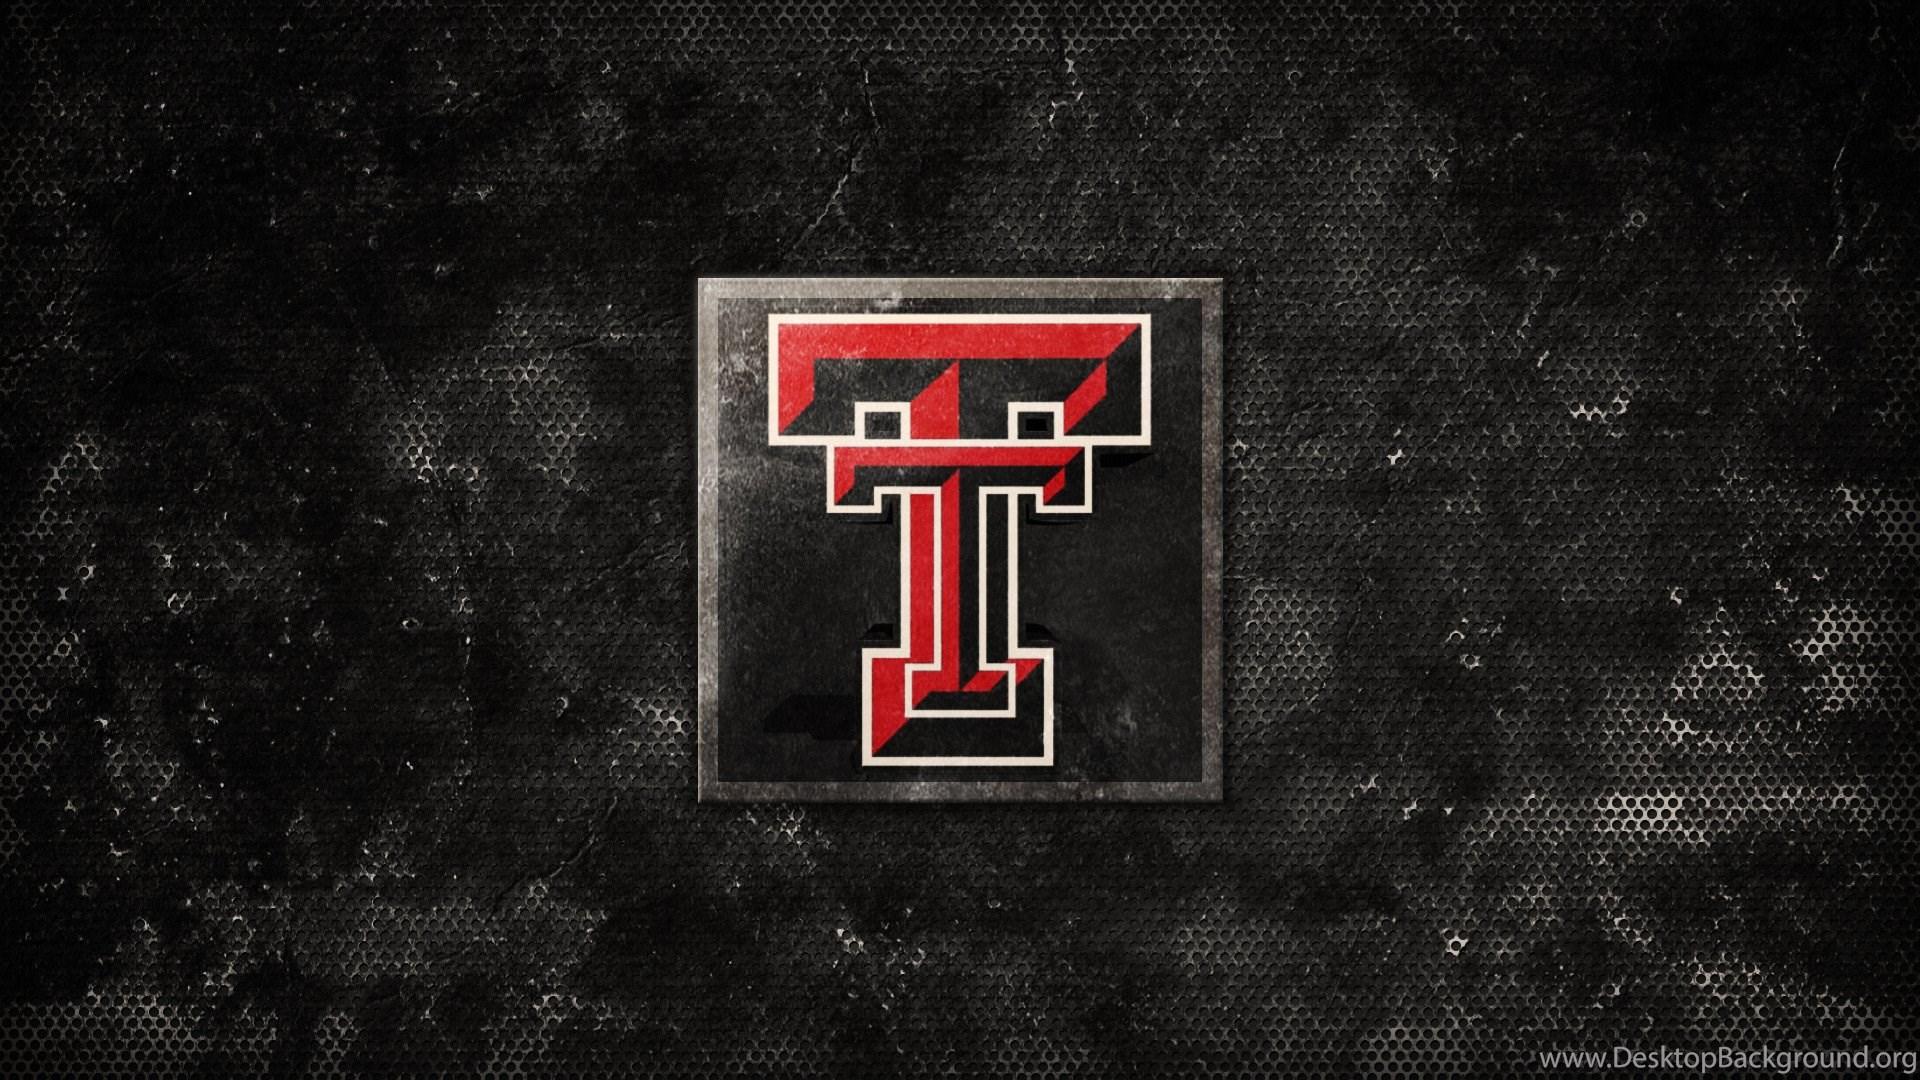 Texas Tech Iphone Wallpaper: Texas Tech Wallpapers Wallpapers Zone Desktop Background